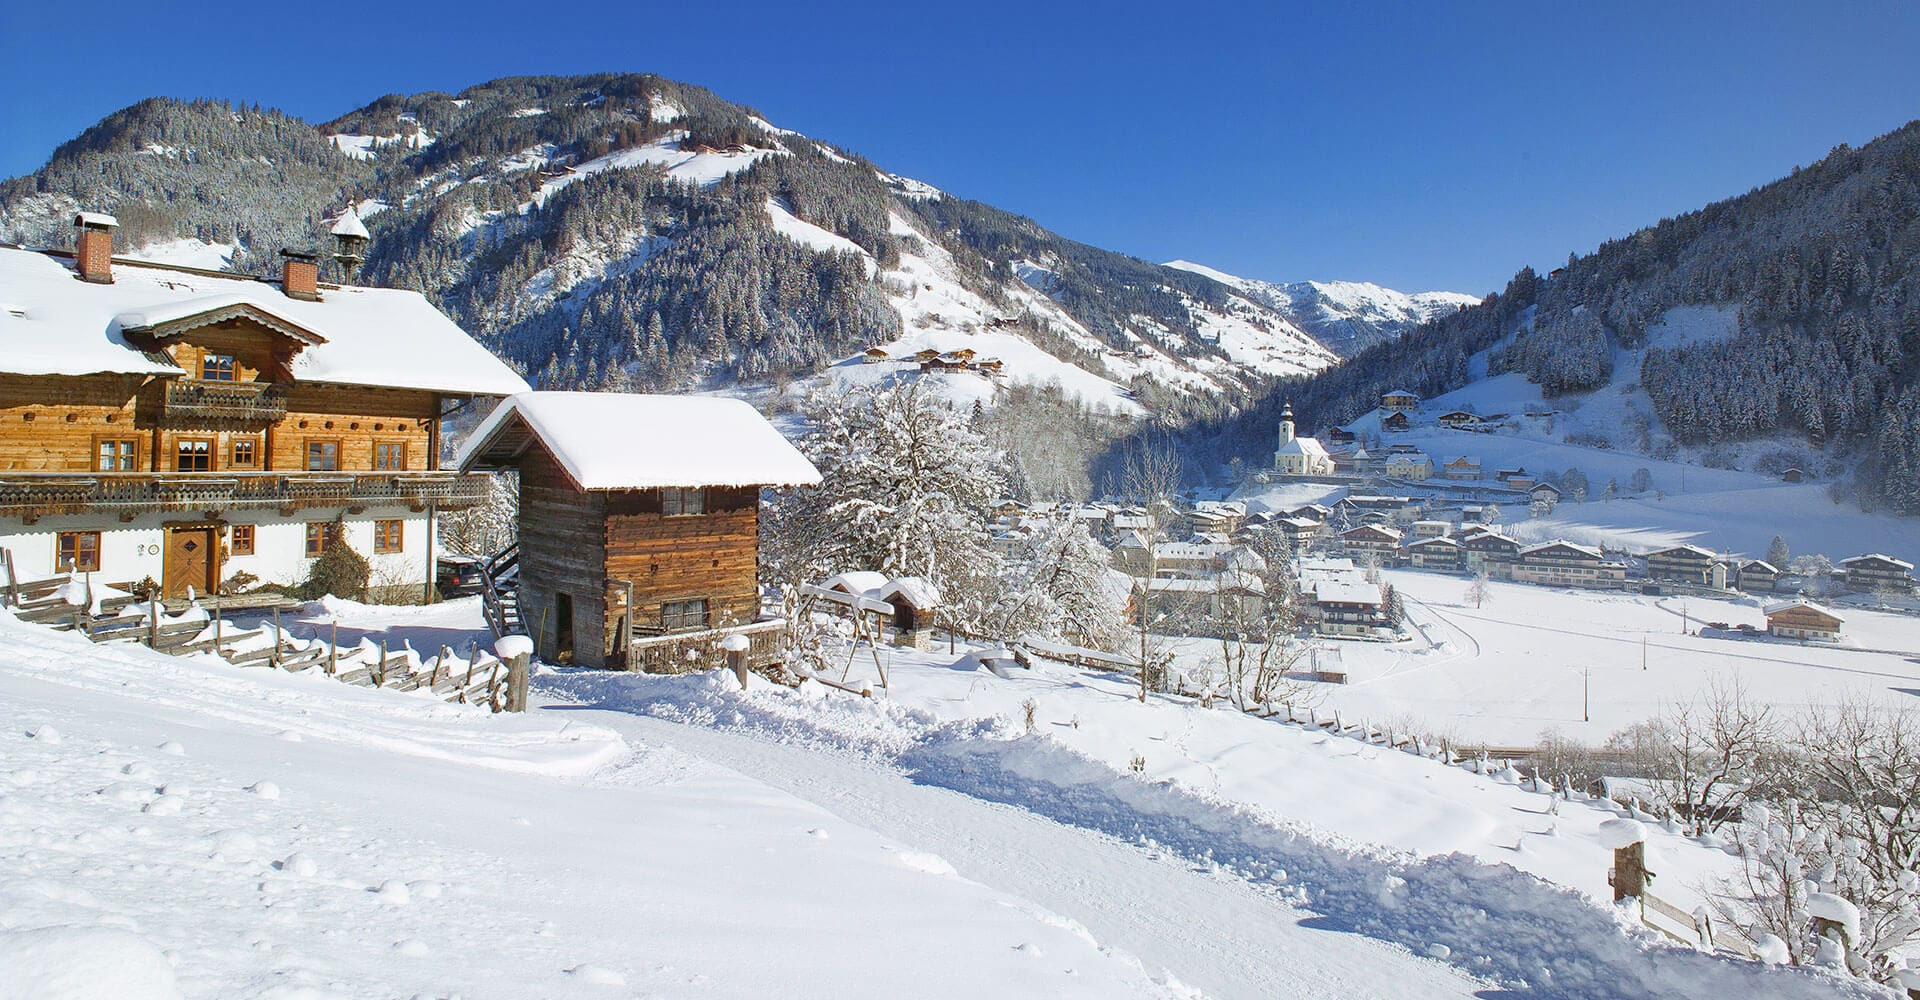 Winter- & Skiurlaub in Großarl, Salzburger Land – Skiverbund Ski amadé